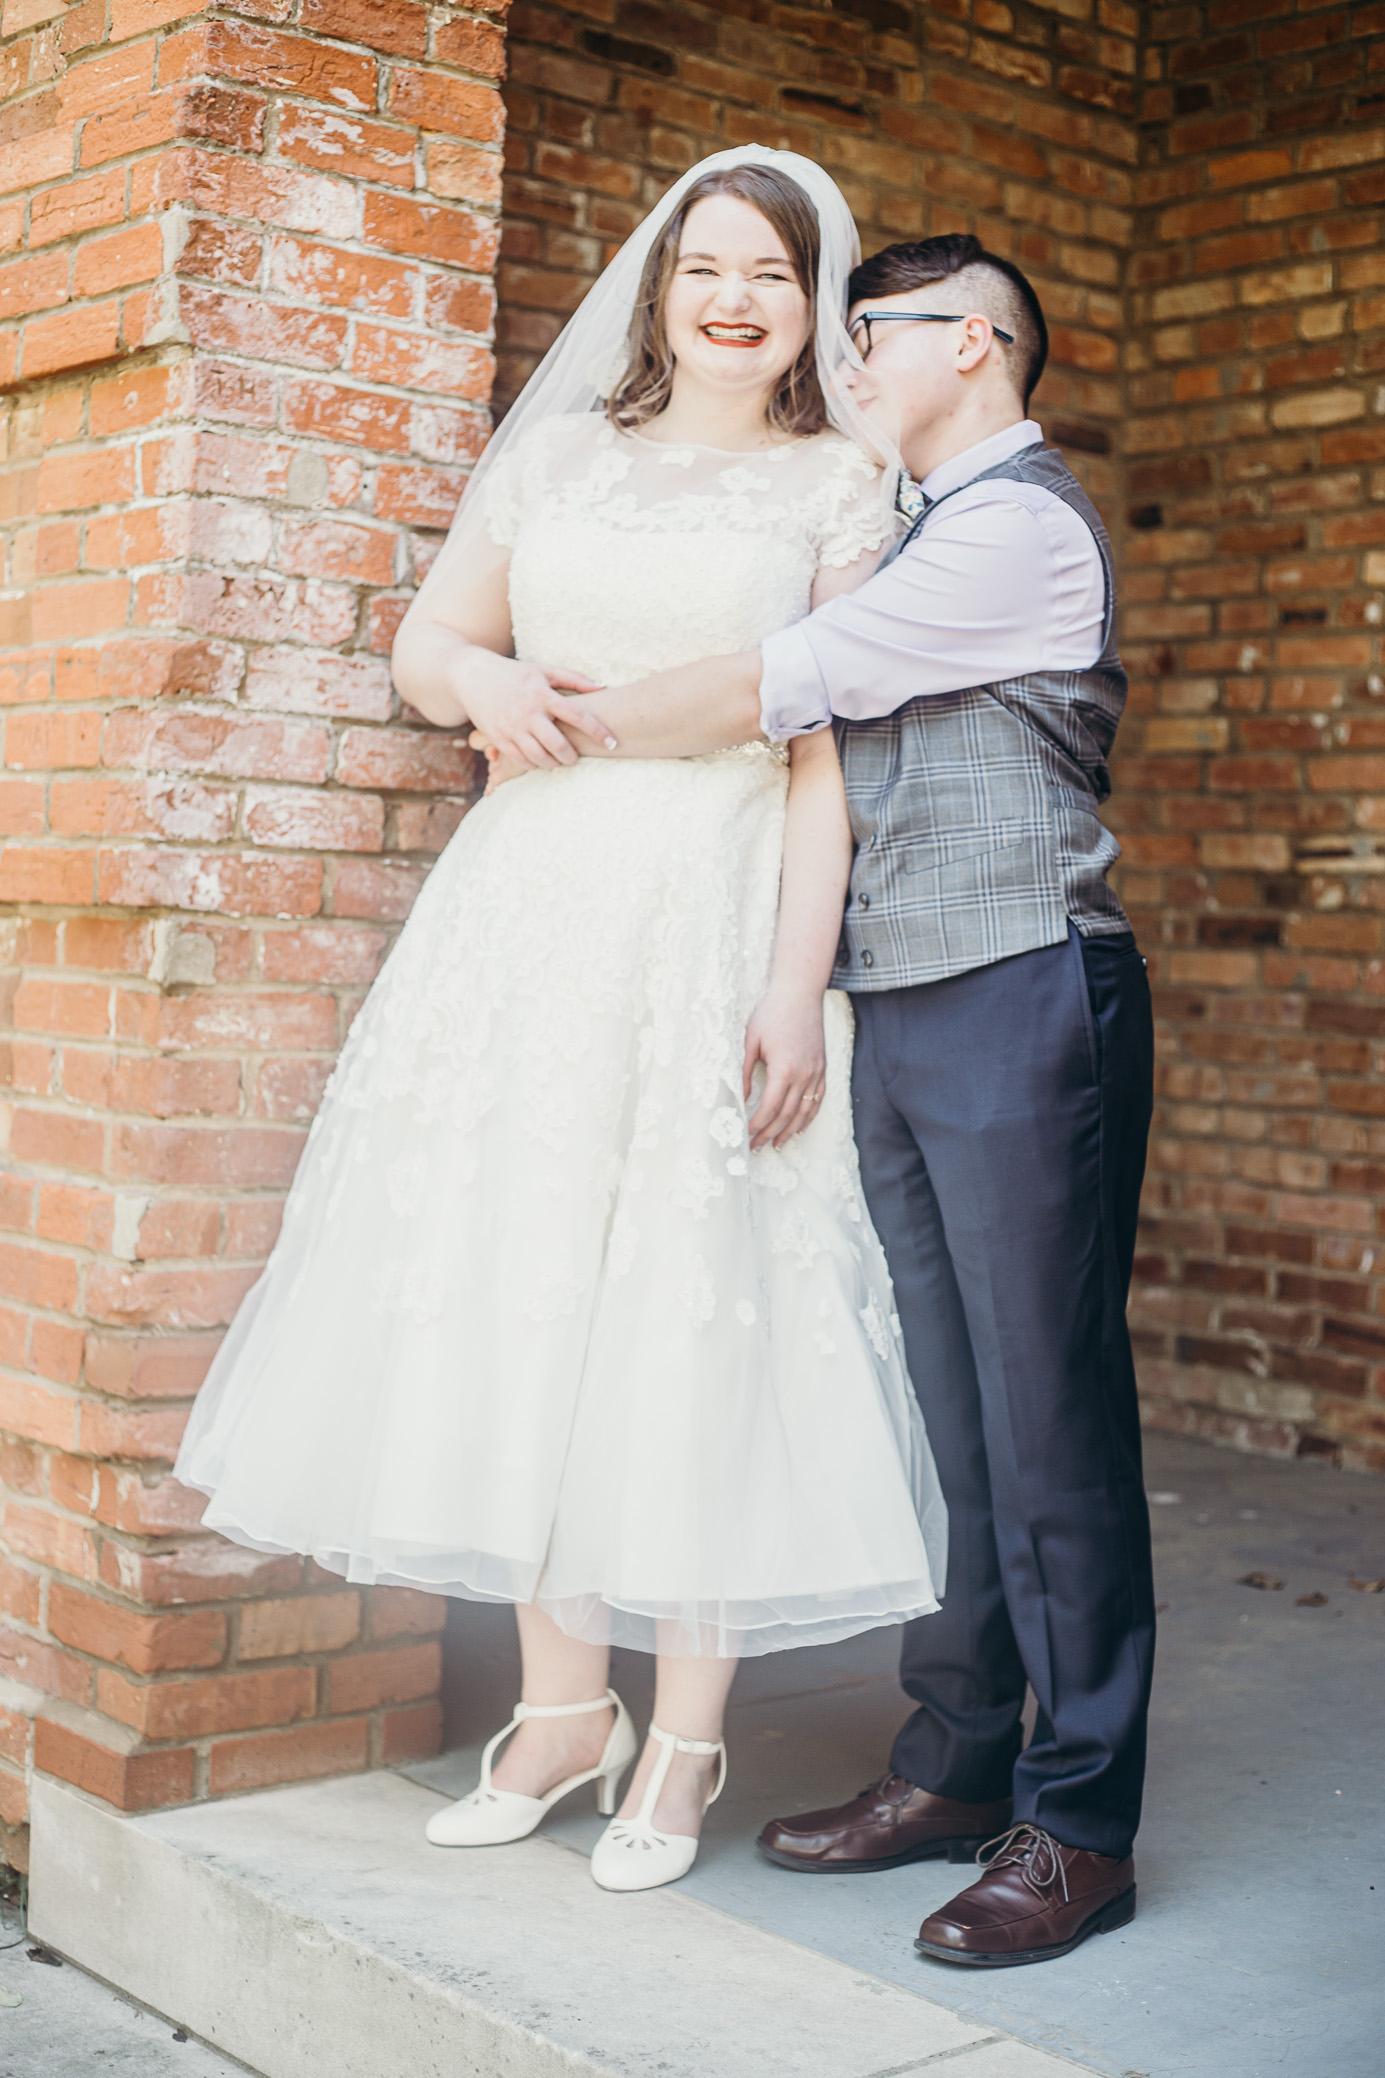 Seattle Washington wedding photography by David A. Smith of DSmithImages Wedding Photography, Portraits, and Events, a wedding photographer in Birmingham, Alabama